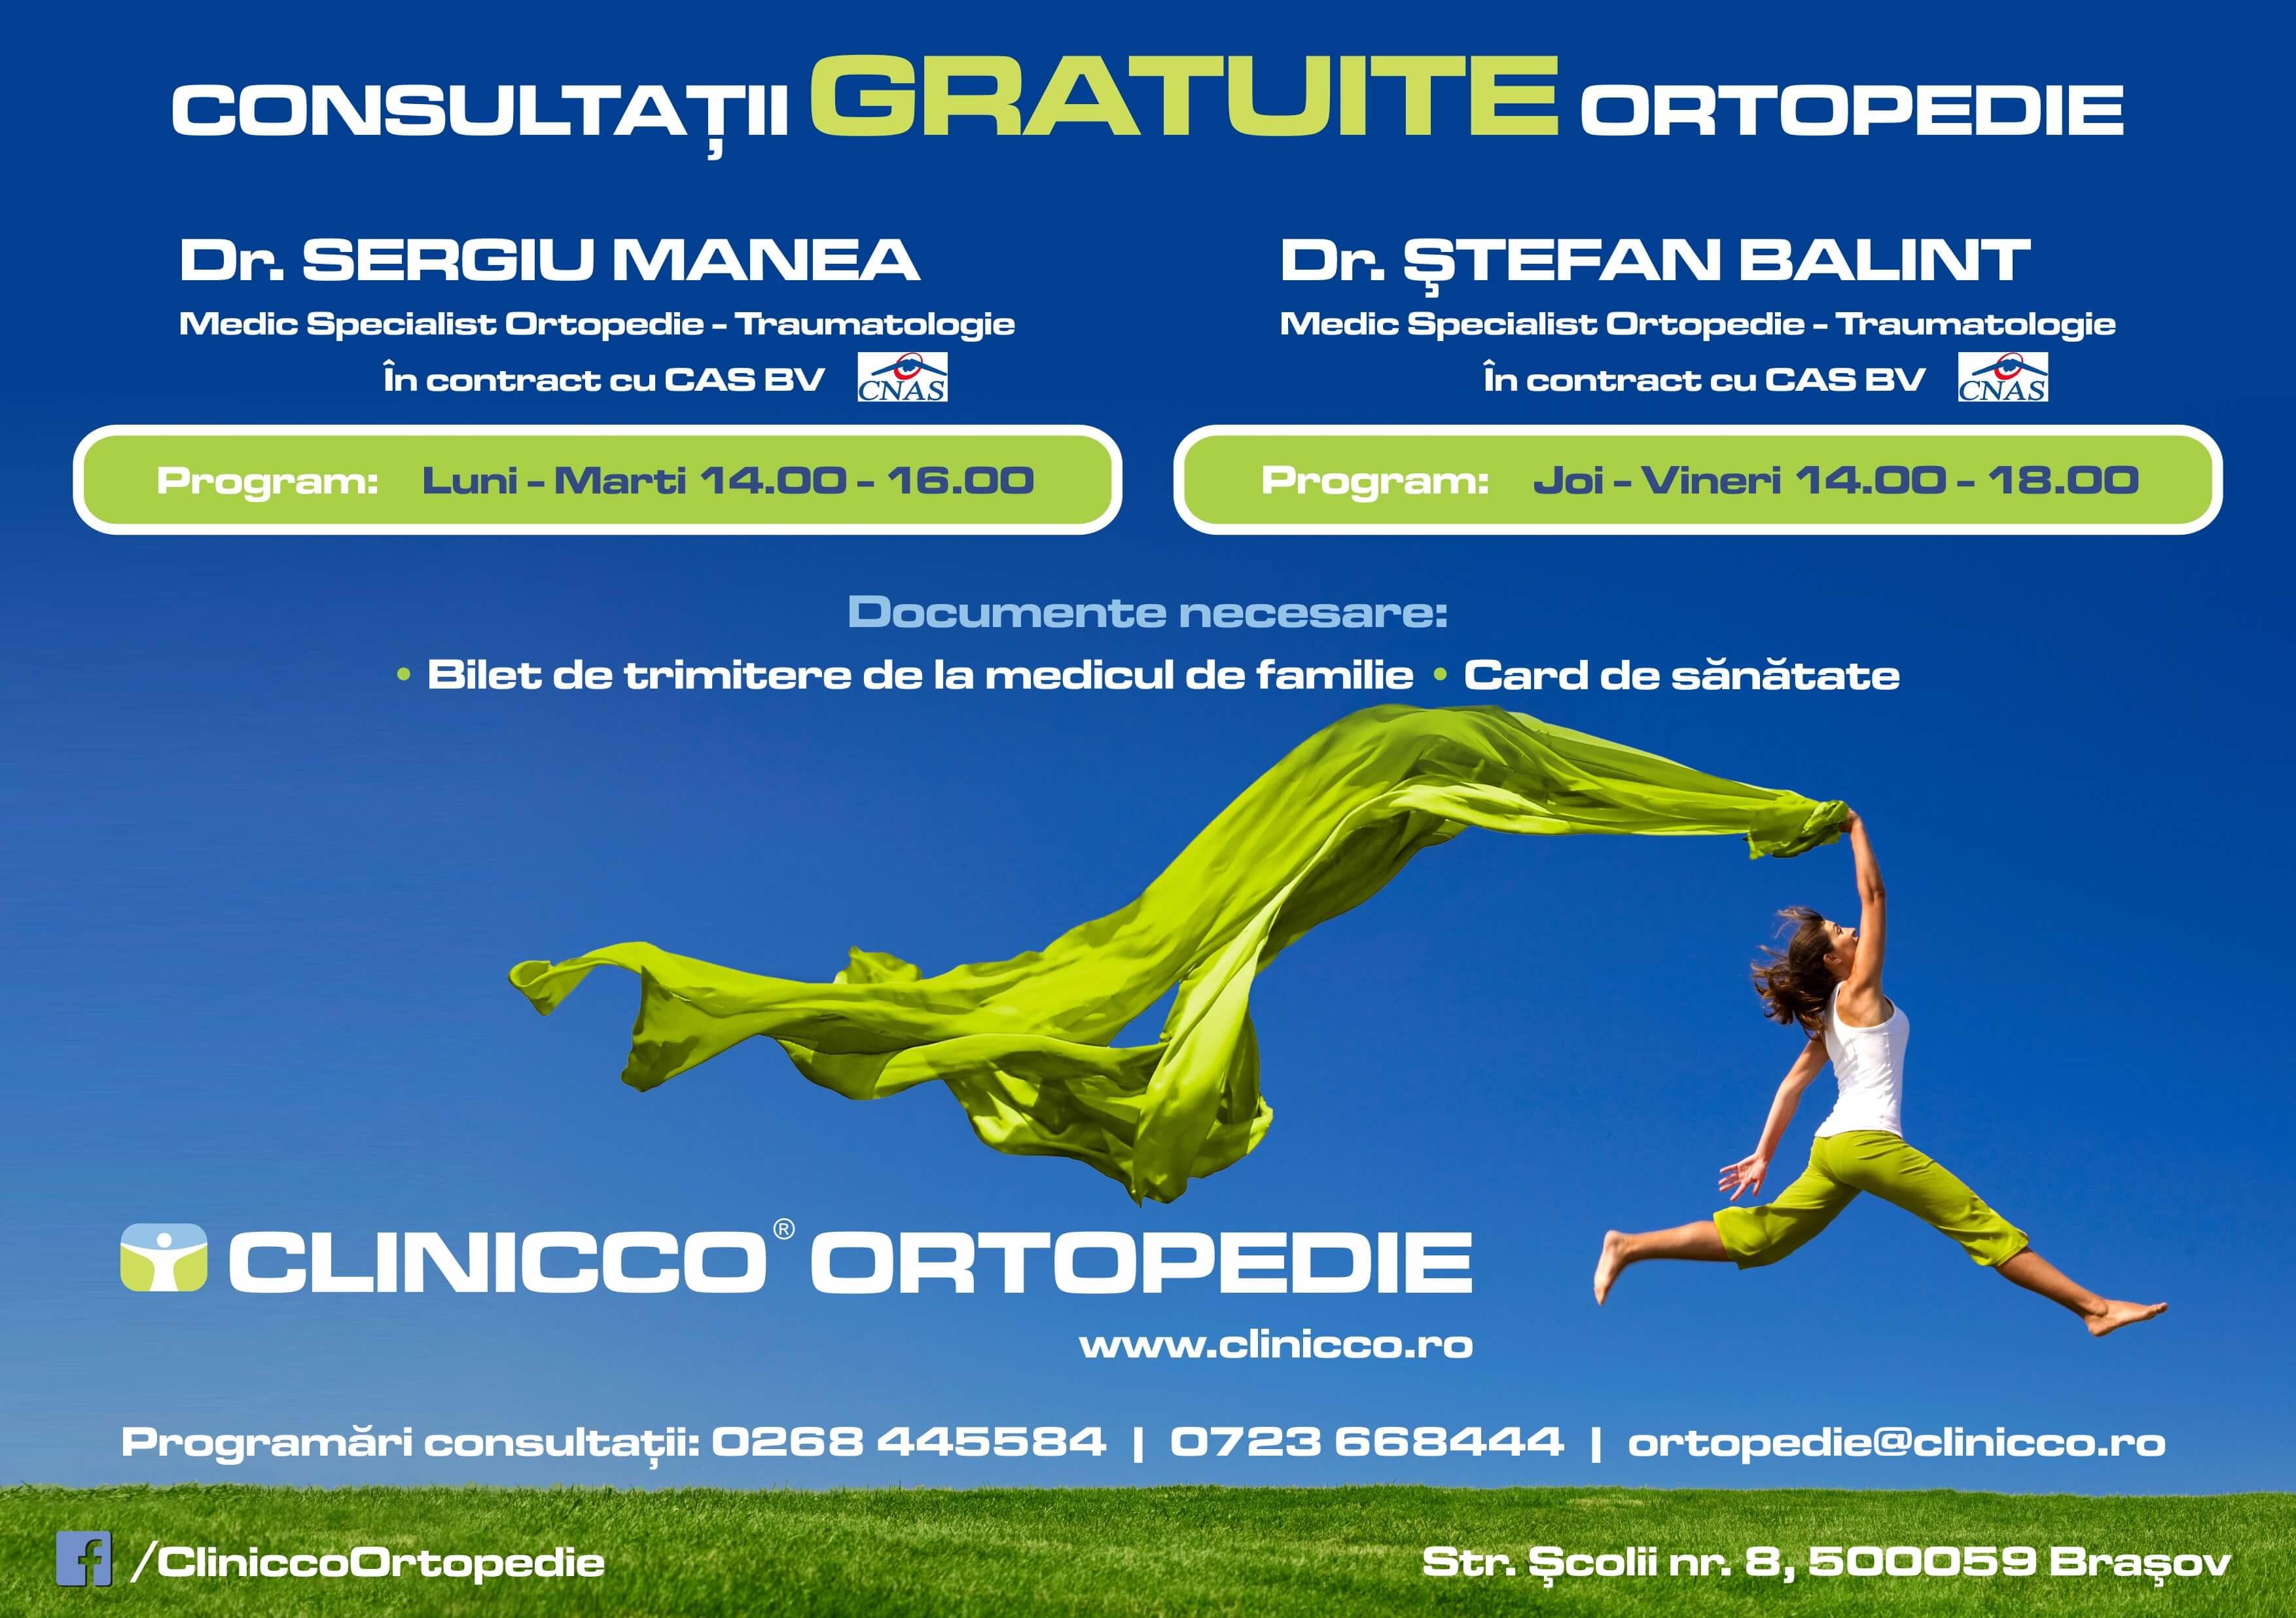 Consultatii gratuite cu bilet de trimitere la Clinicco Ortopedie